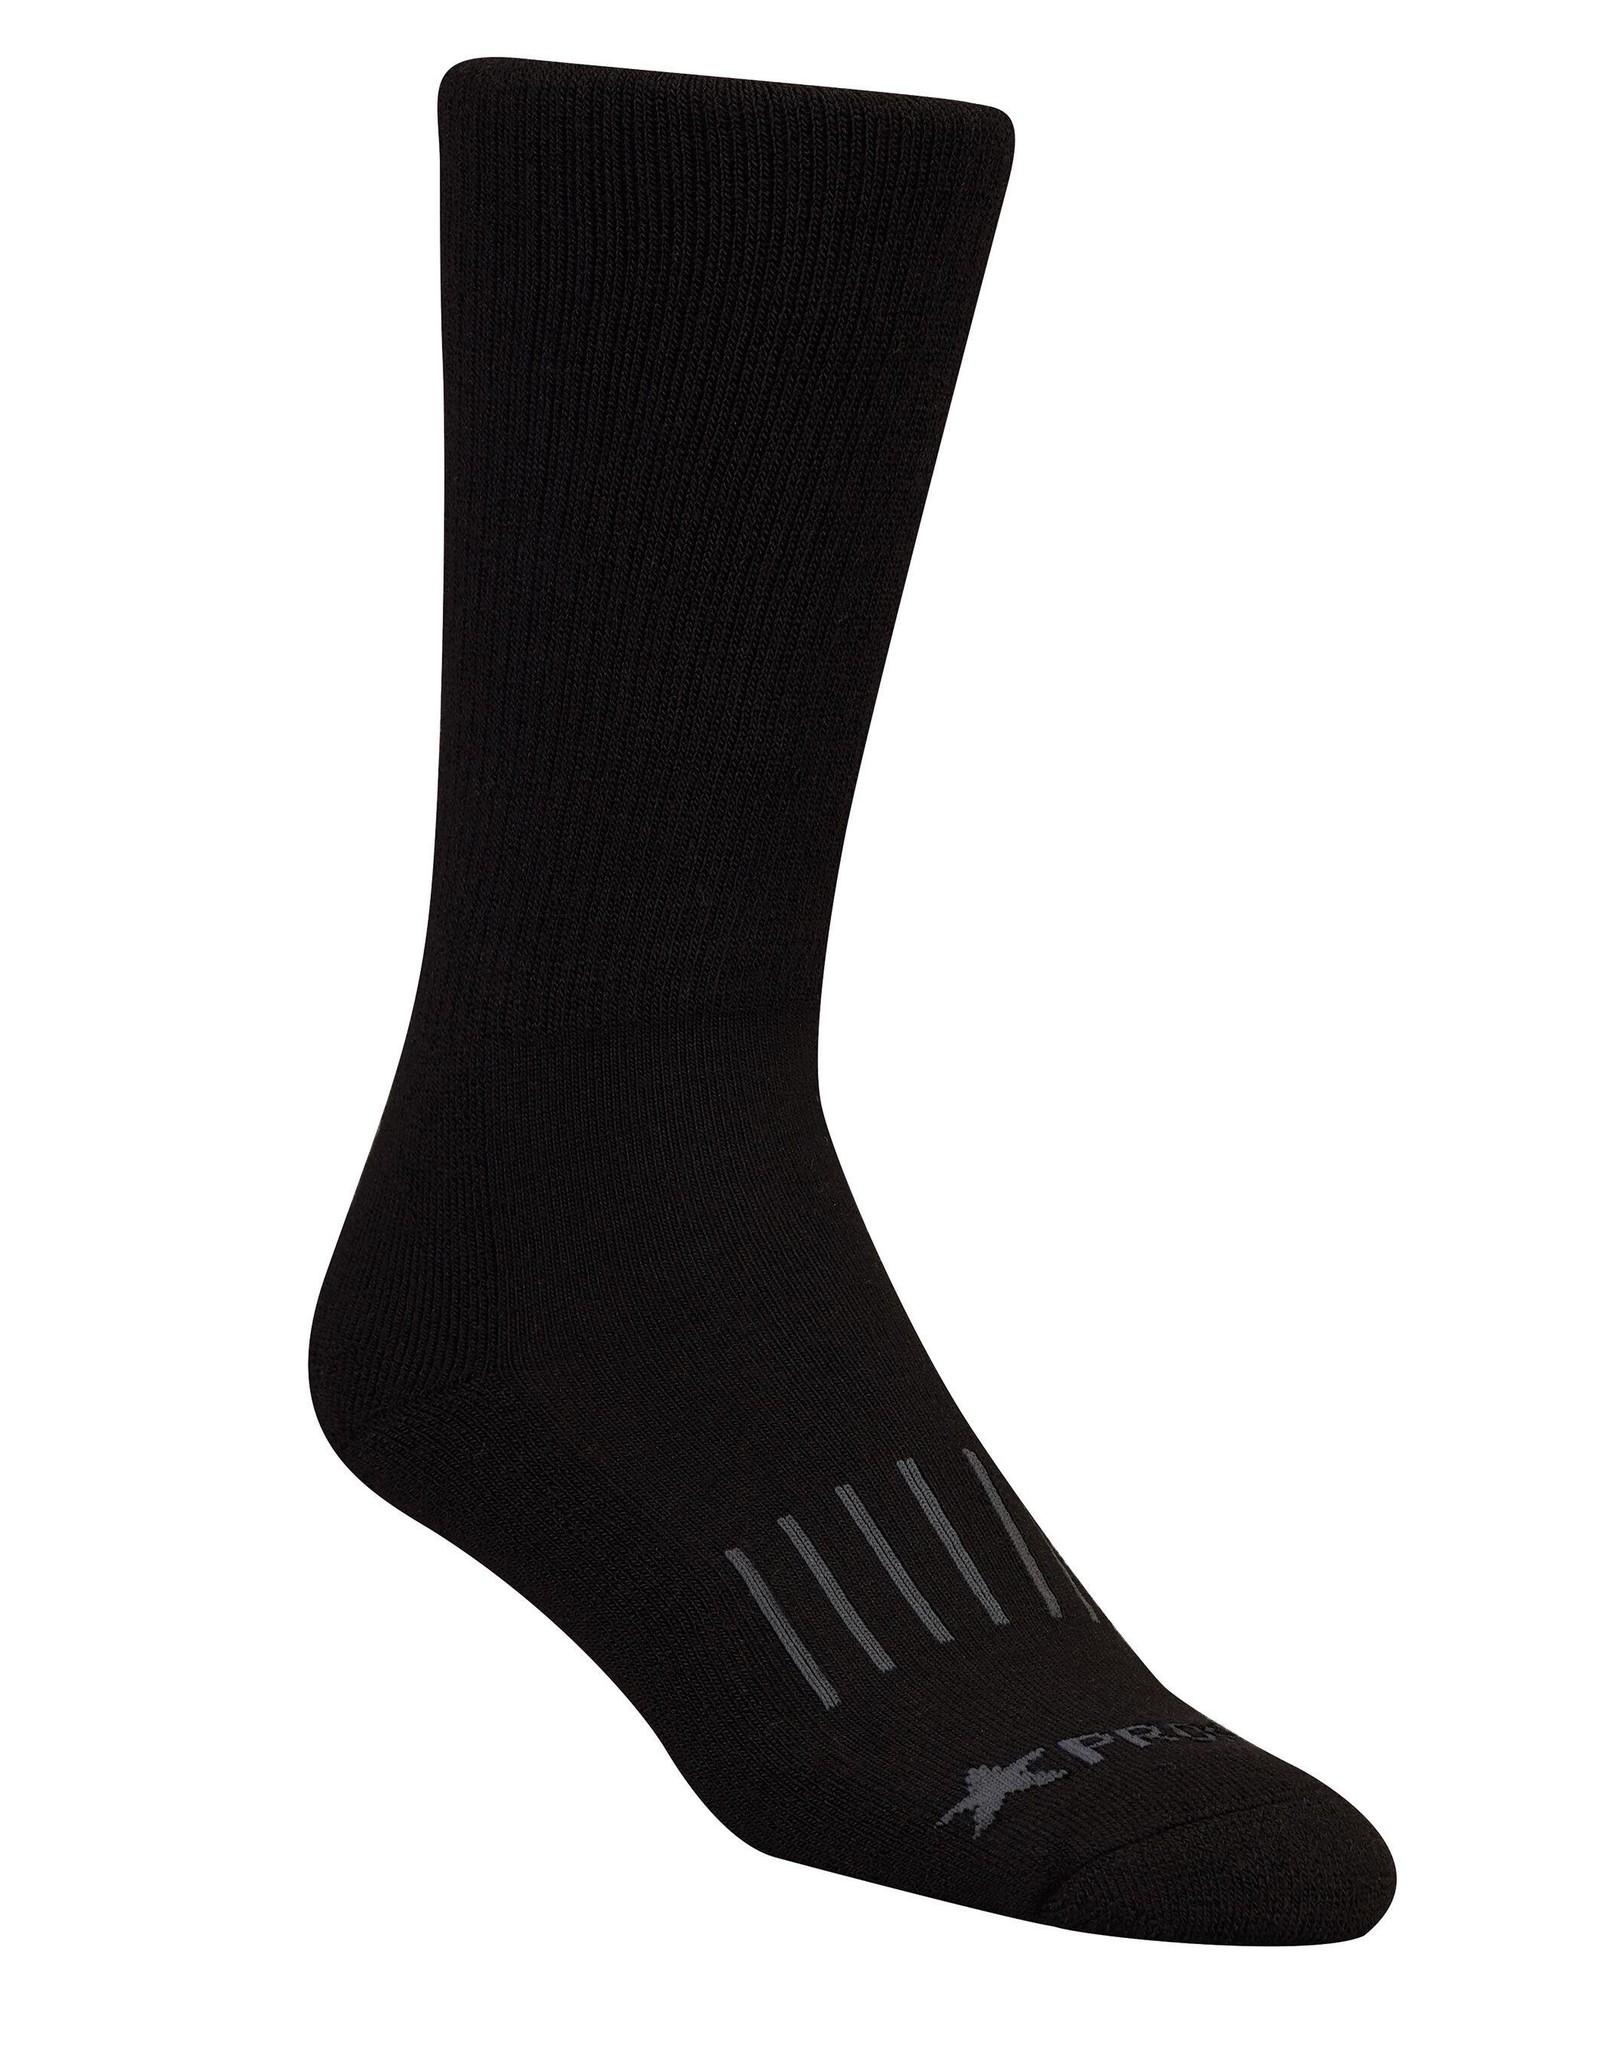 Propper Merino Wool Boot Sock (Large)